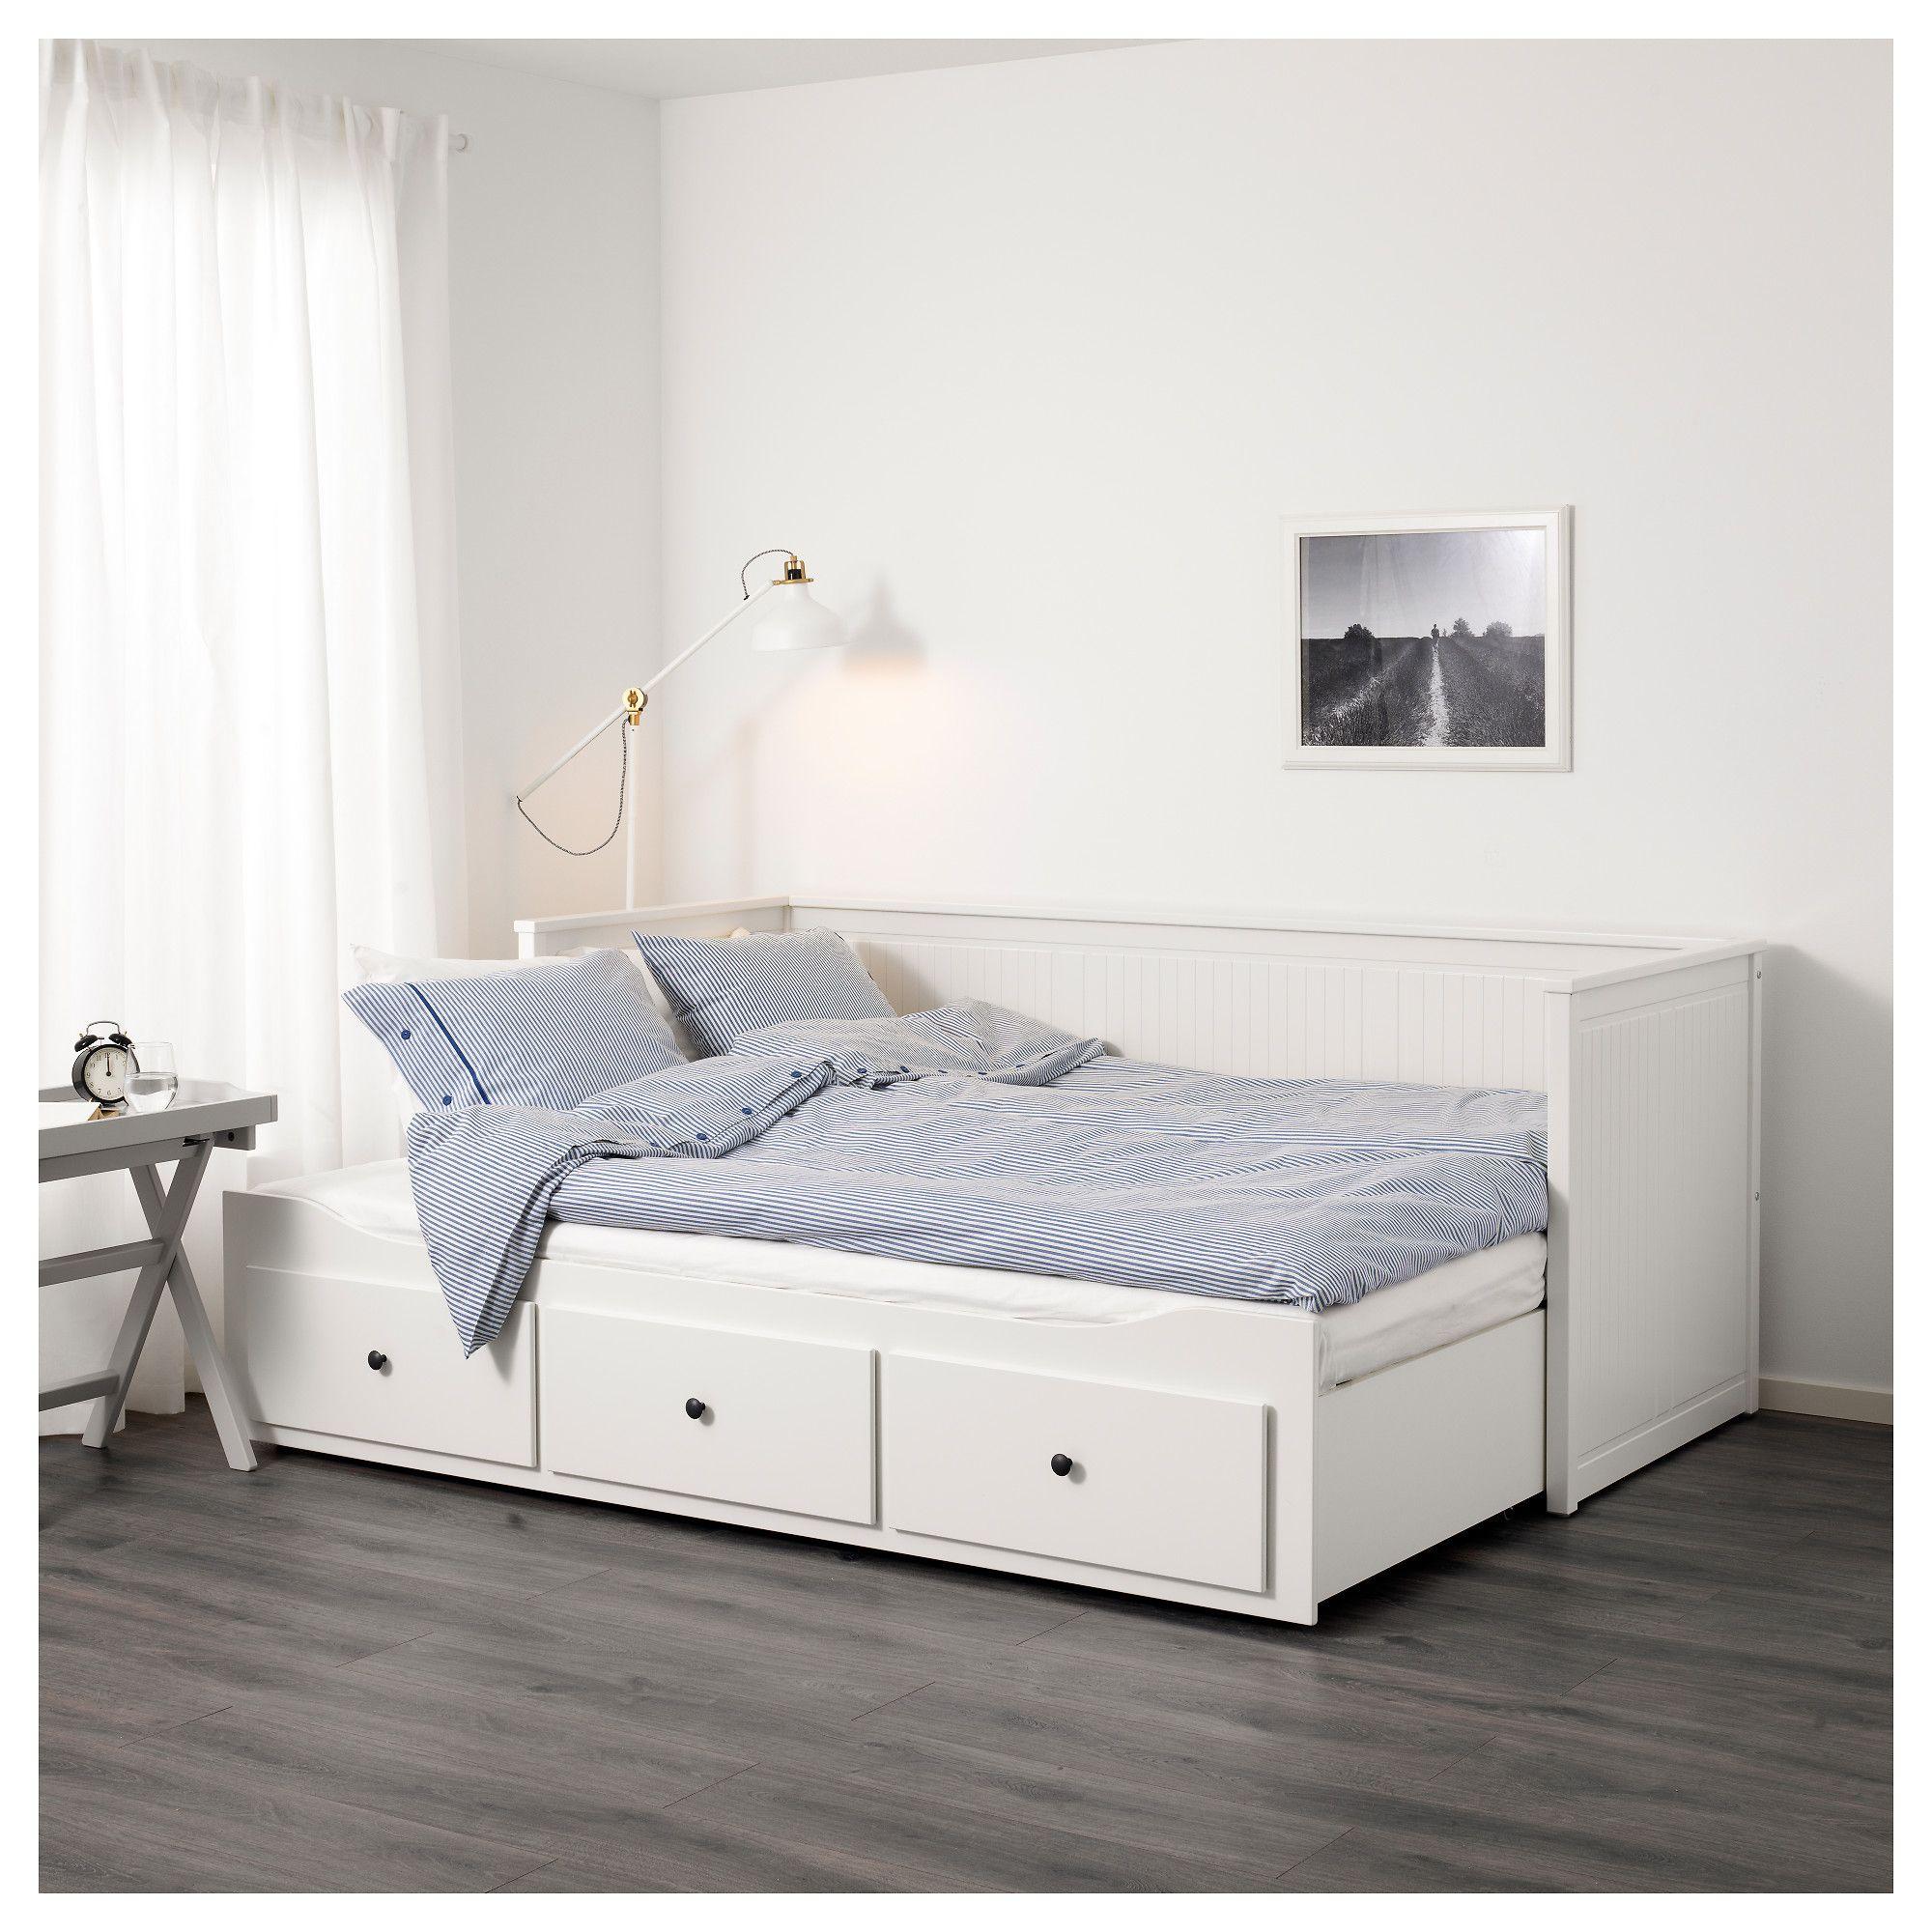 HEMNES κρεβάτι day-bed με 3 συρτάρια - IKEA | home sweet home <3 ...